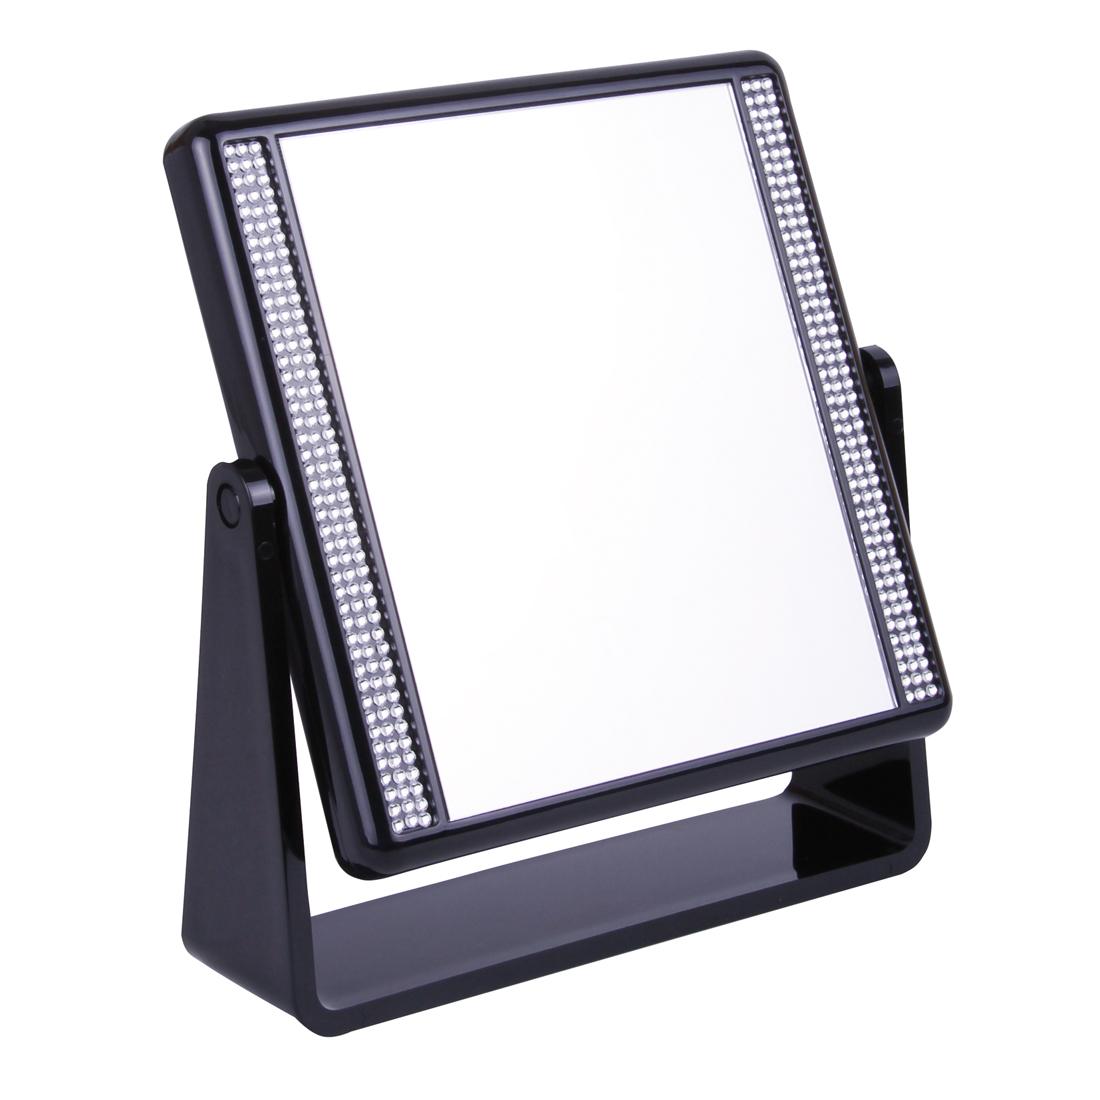 932 16 Blk - Black & White Stones 5x Magnification Mirror - 932/16